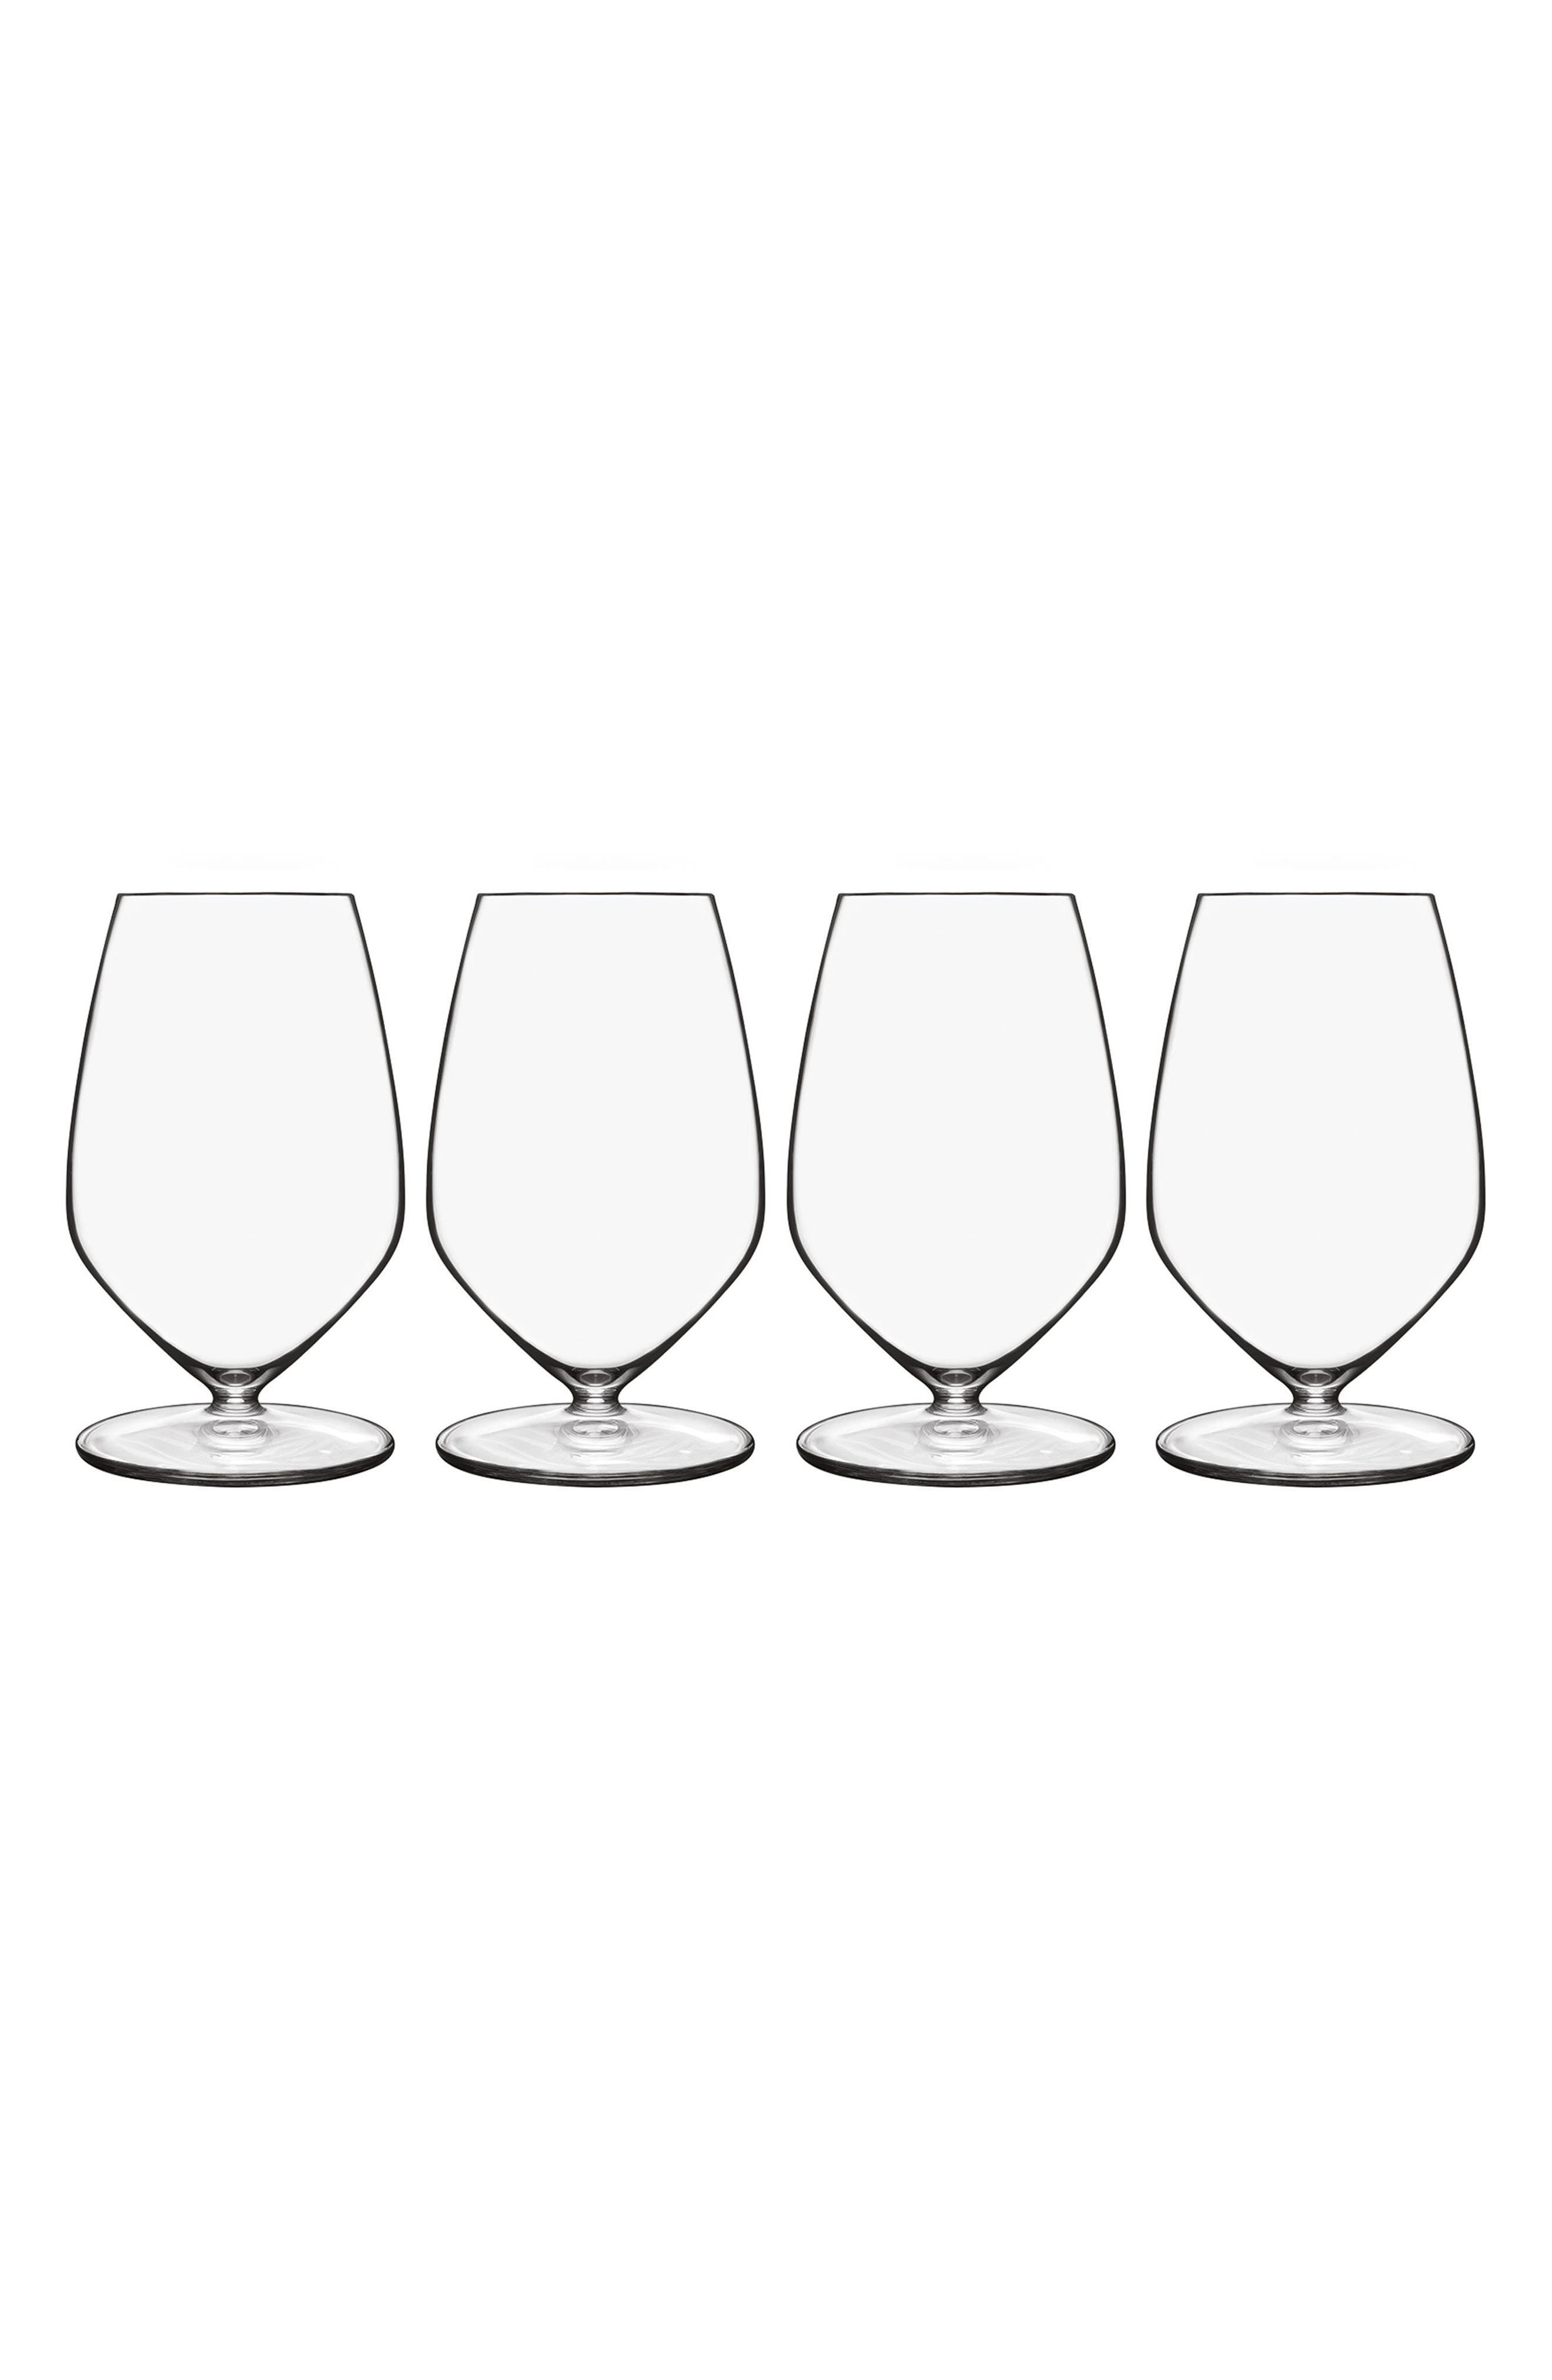 Alternate Image 1 Selected - Luigi Bormioli T-Glass Set of 4 Riesling Glasses